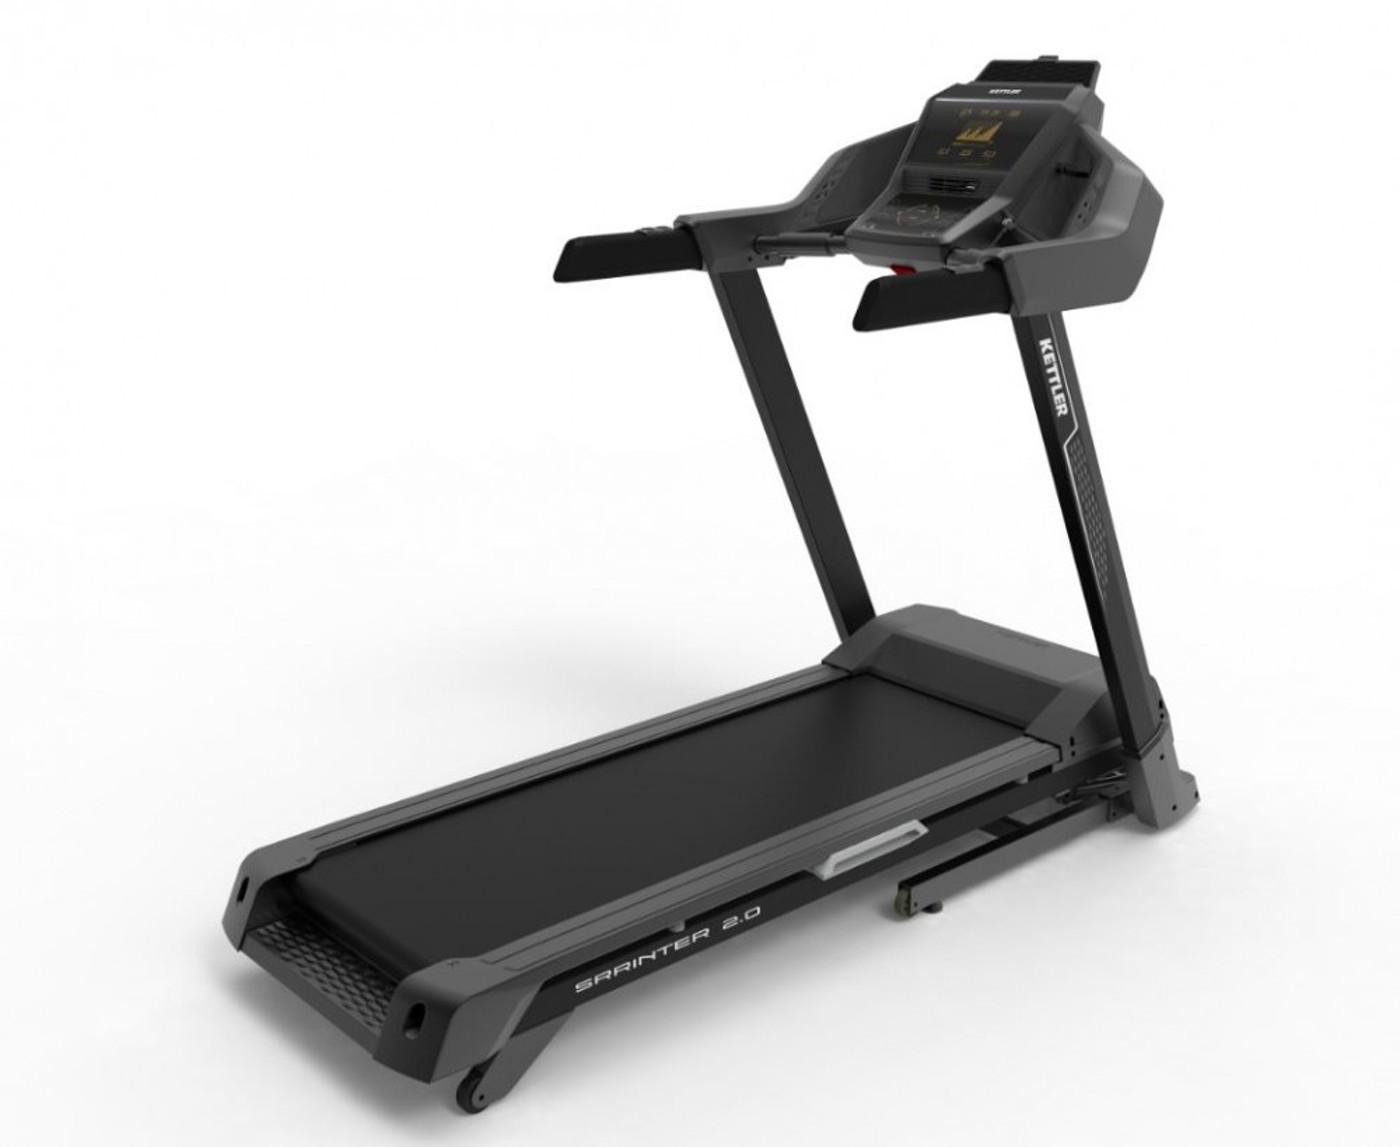 KETTLER Laufband Sprinter 2.0